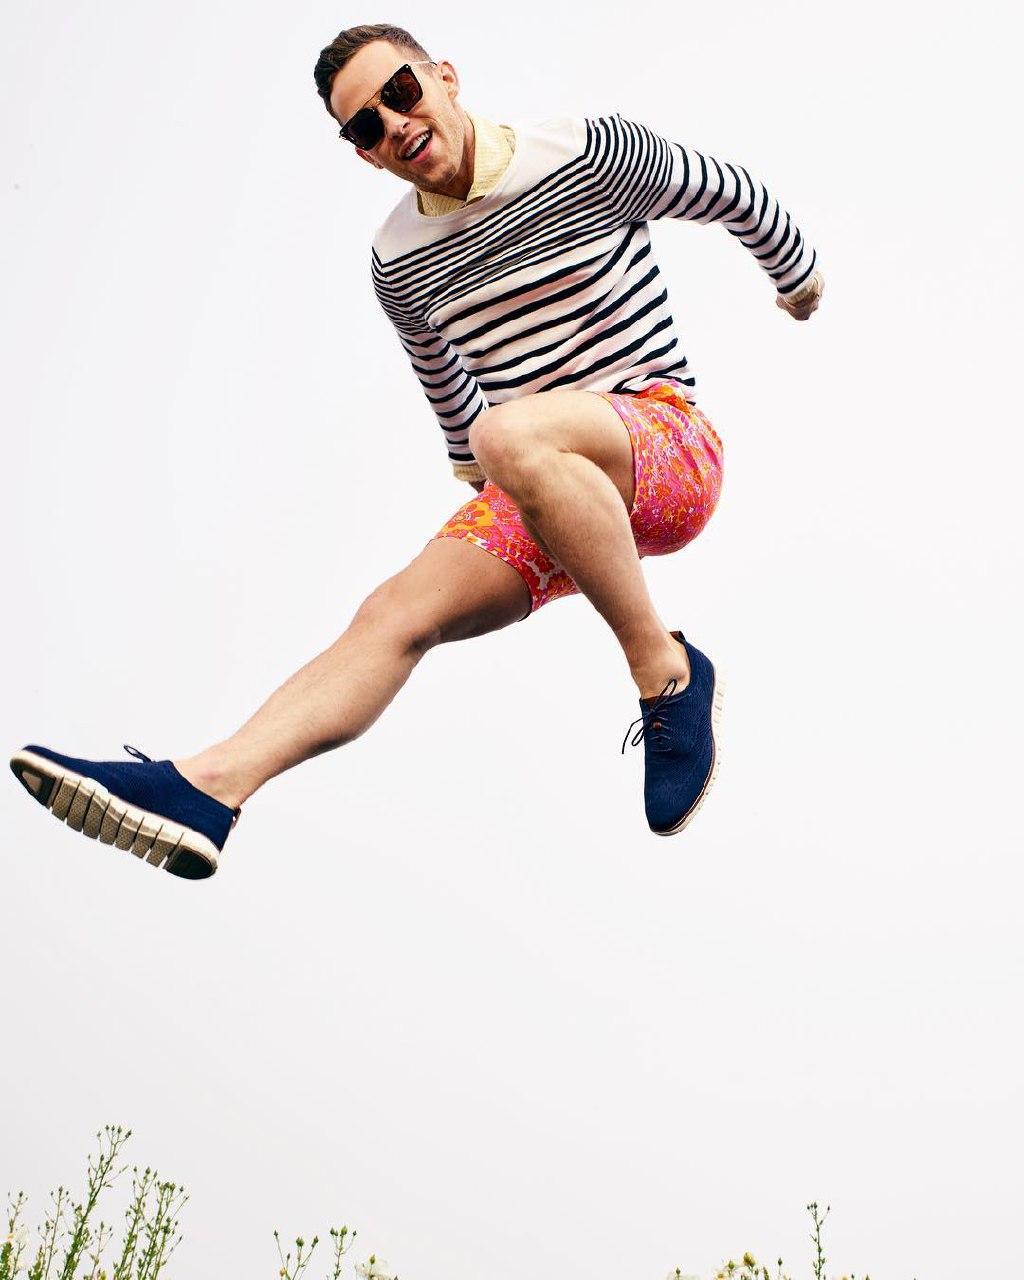 Эшли Вагнер & Адам Риппон / Ashley WAGNER & Adam RIPPON USA - Страница 23 Jngts